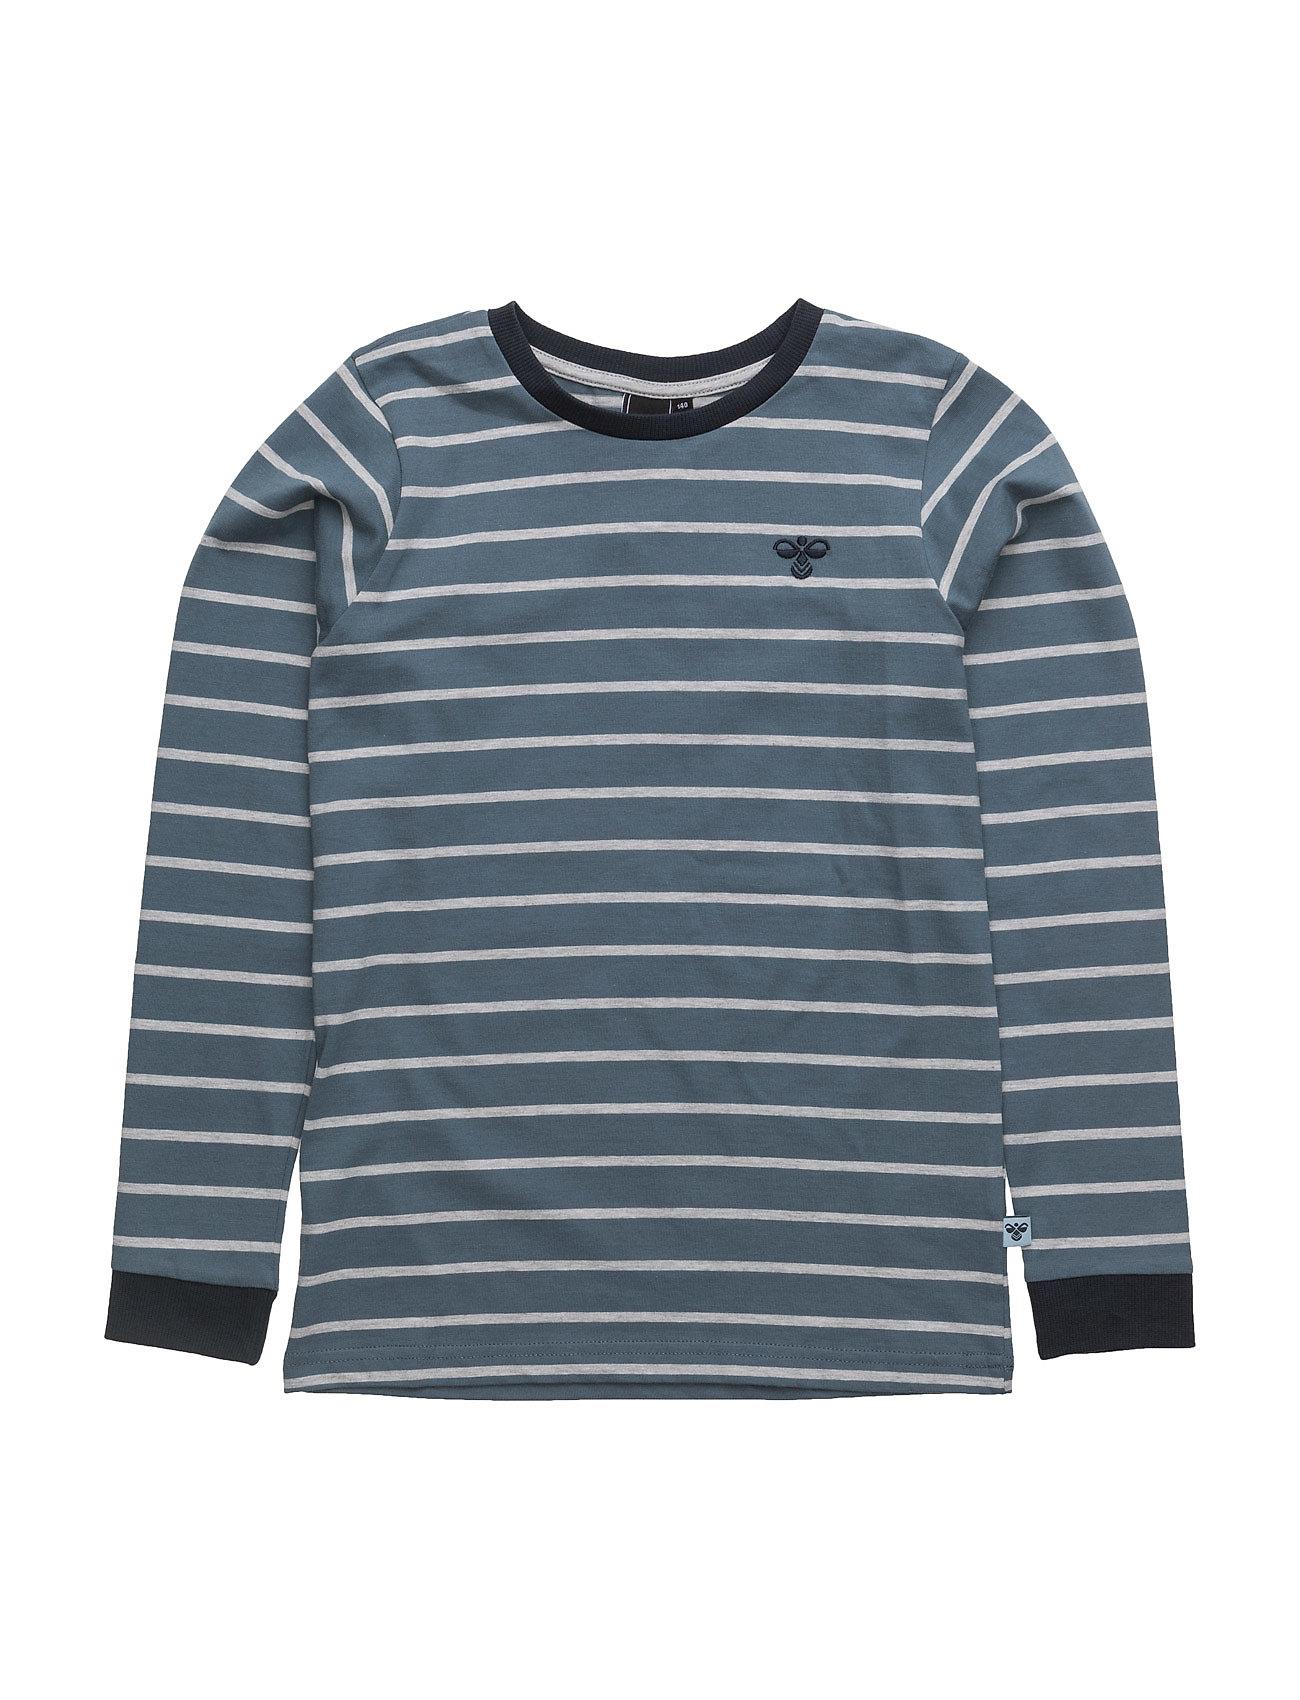 Tuffa Thomas Ls Tee Ss17 Hummel Sleeve T-Shirts till Barn i trevliga ... 7746101b81261